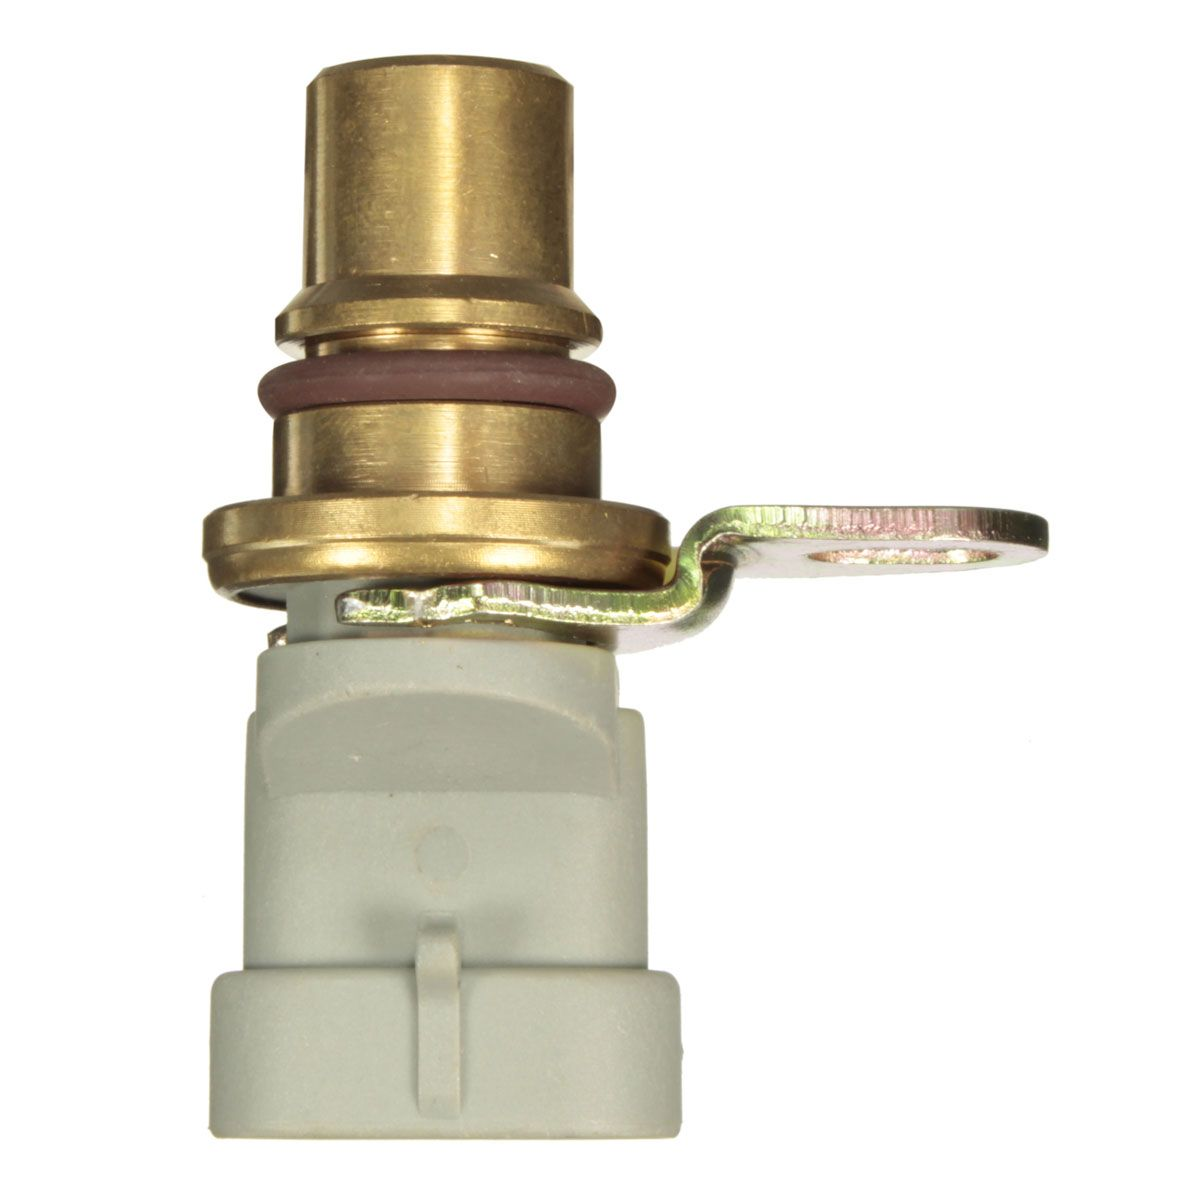 Crankshaft CamShaft Position Sensor CPS Cam for Buick /Chevrolet /GMC /Isuzu 10456250 /SU1069 /25347261